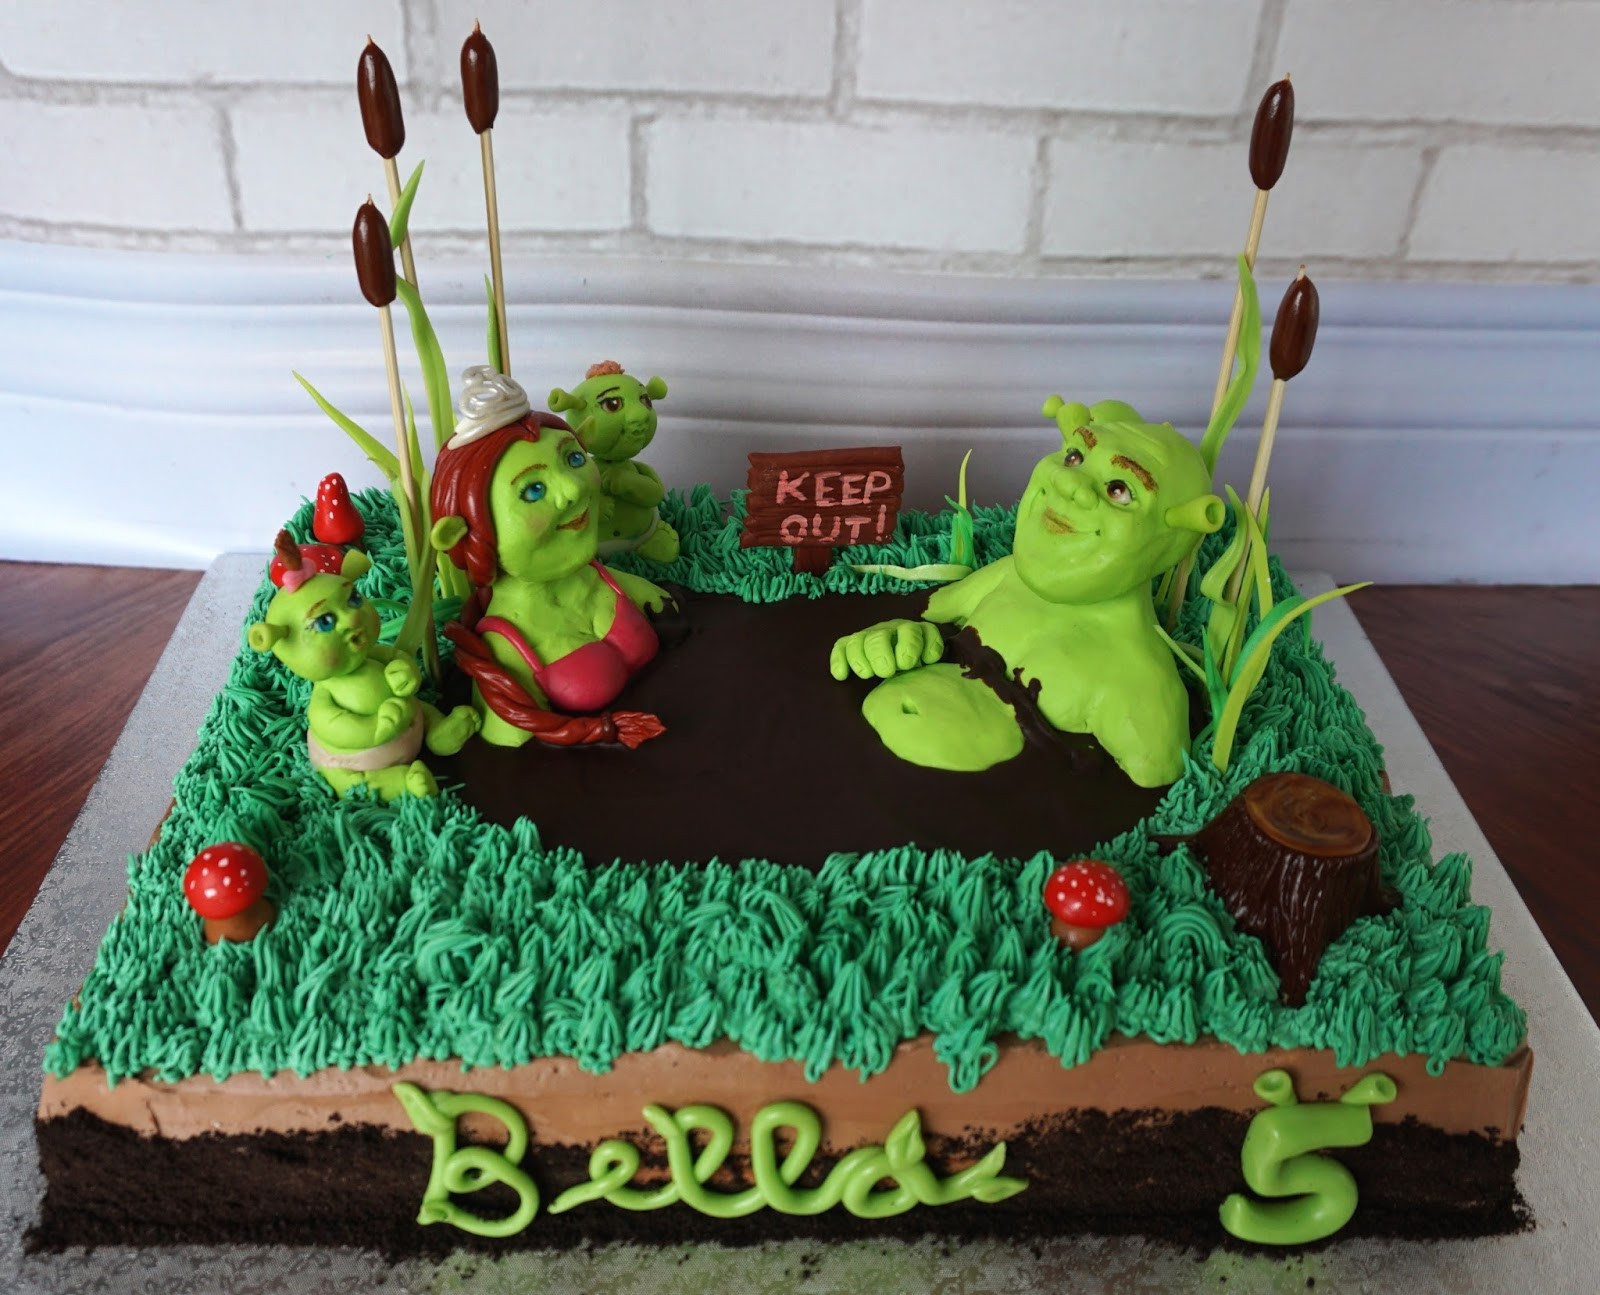 Shrek Birthday Cake  Custom Cakes by Lori Shrek family cake in a mud bath for